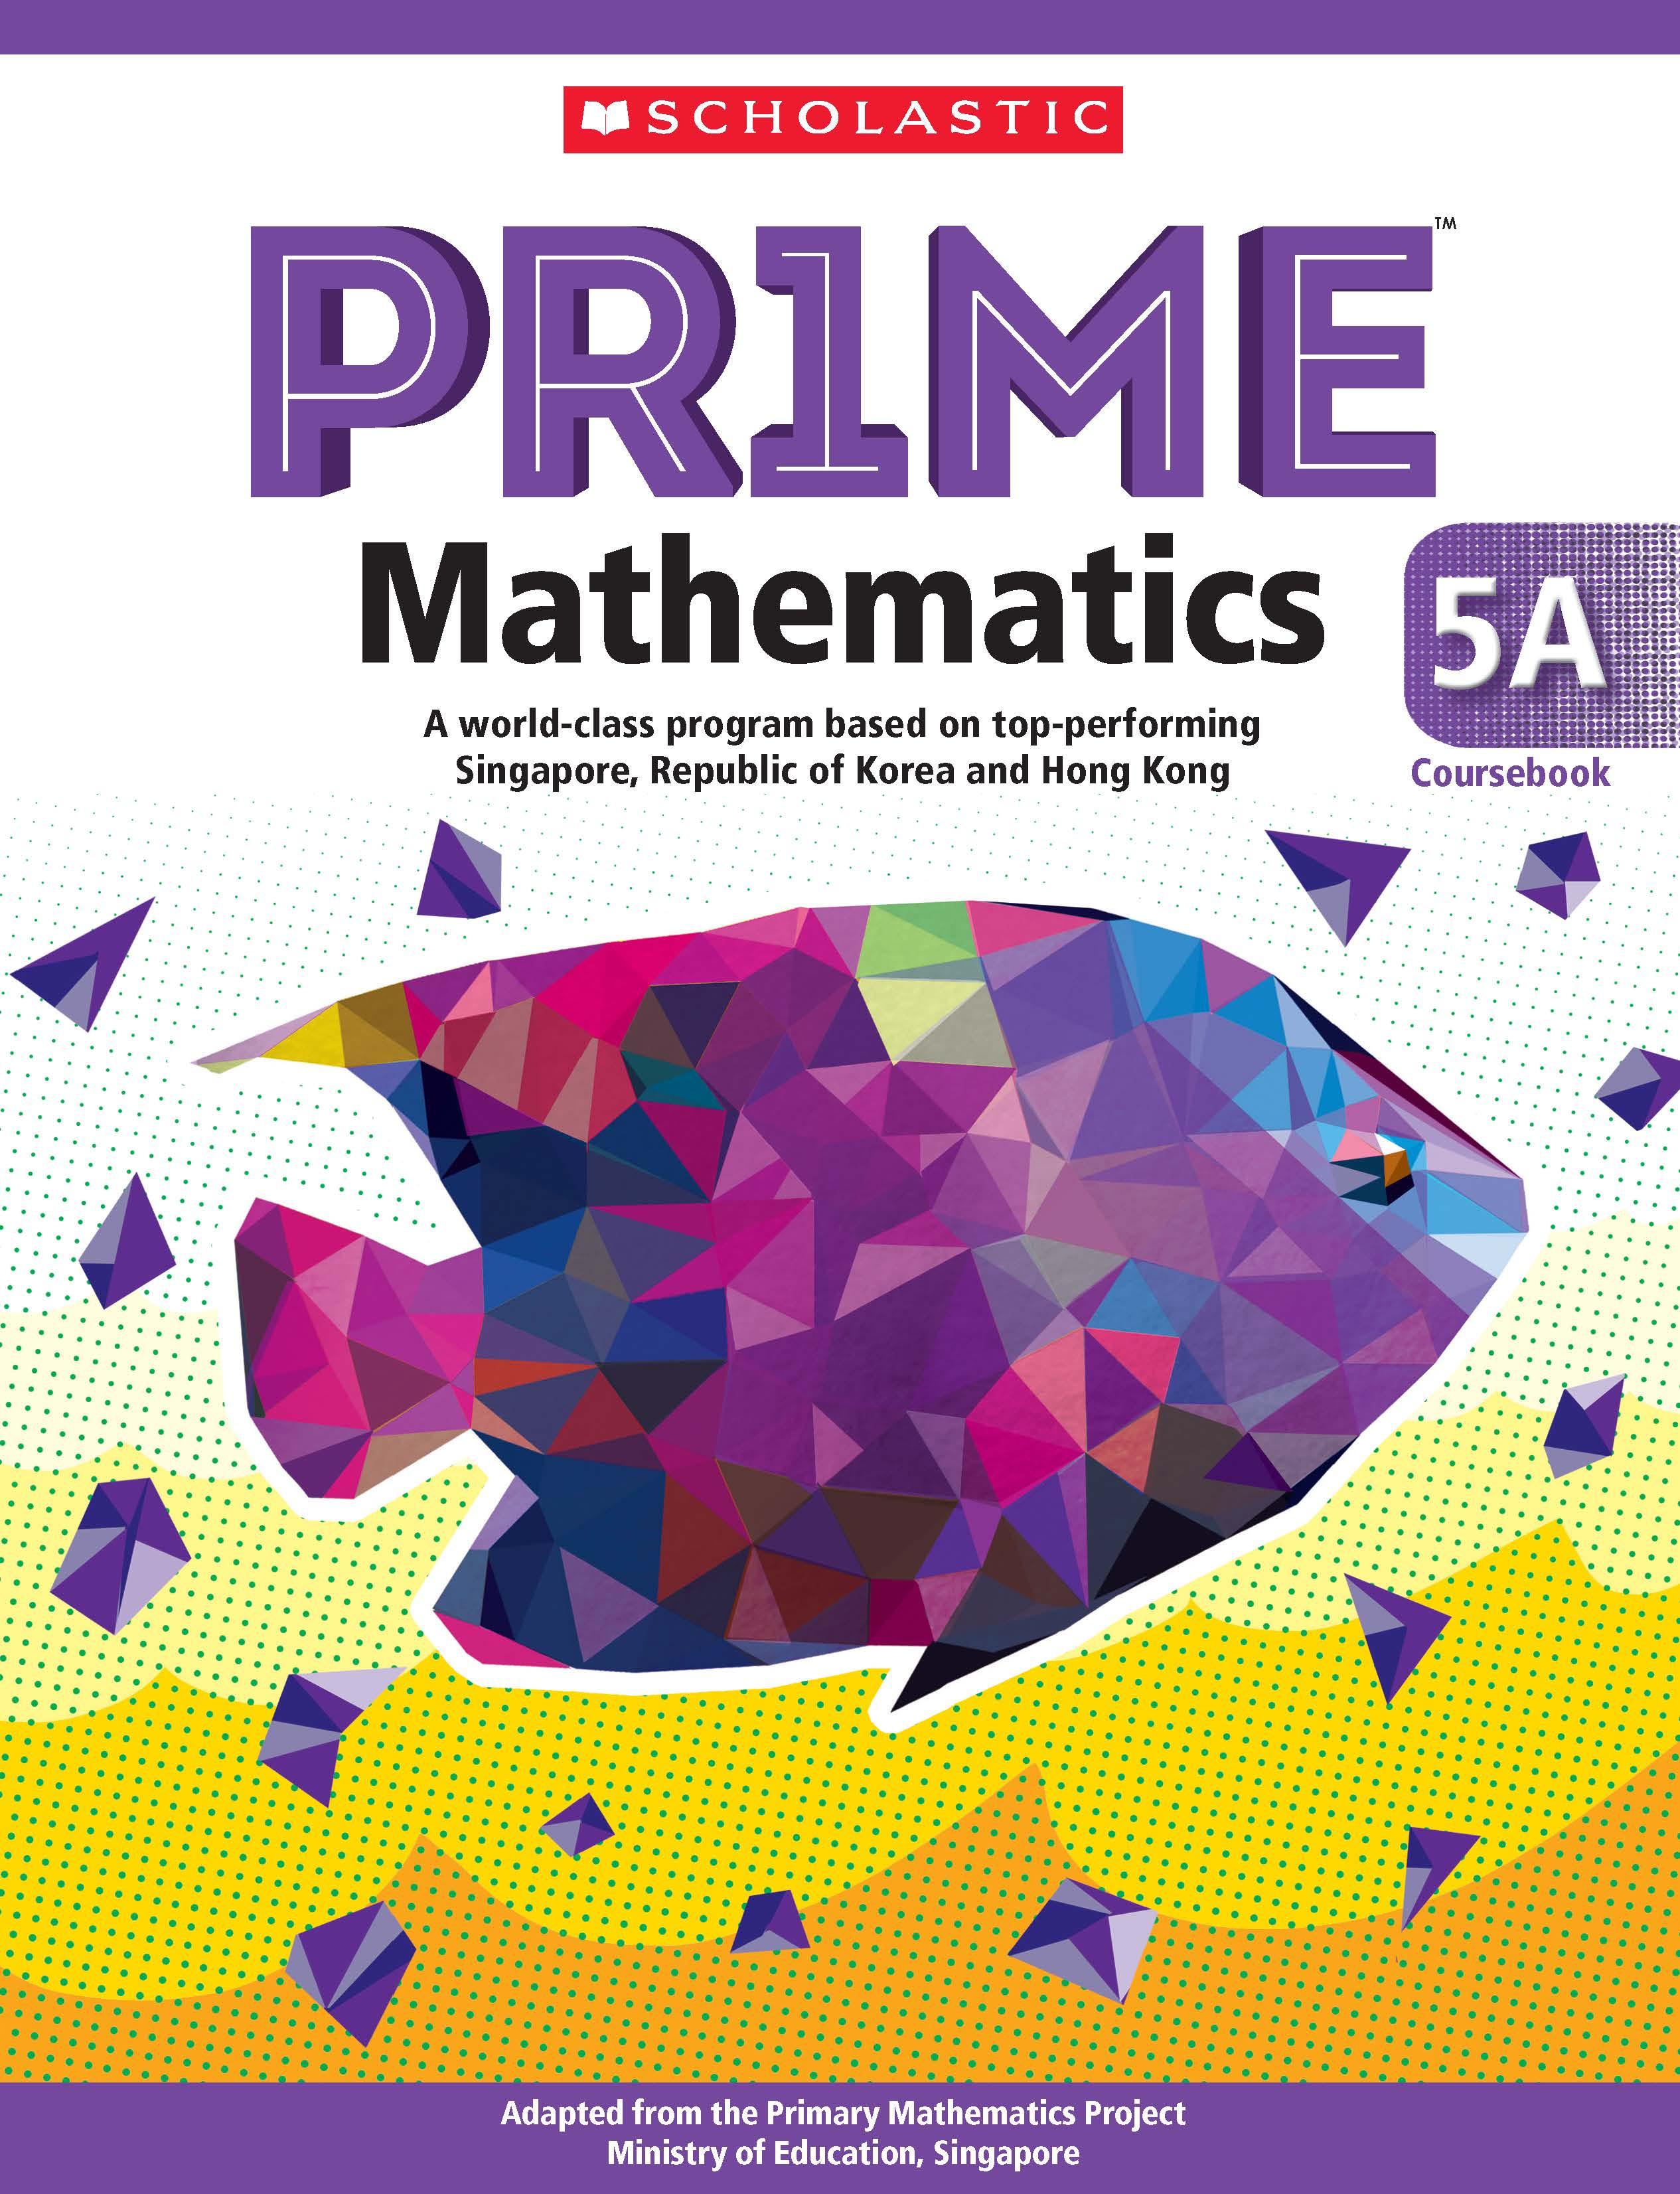 Prime Mathematics Coursebook 5A